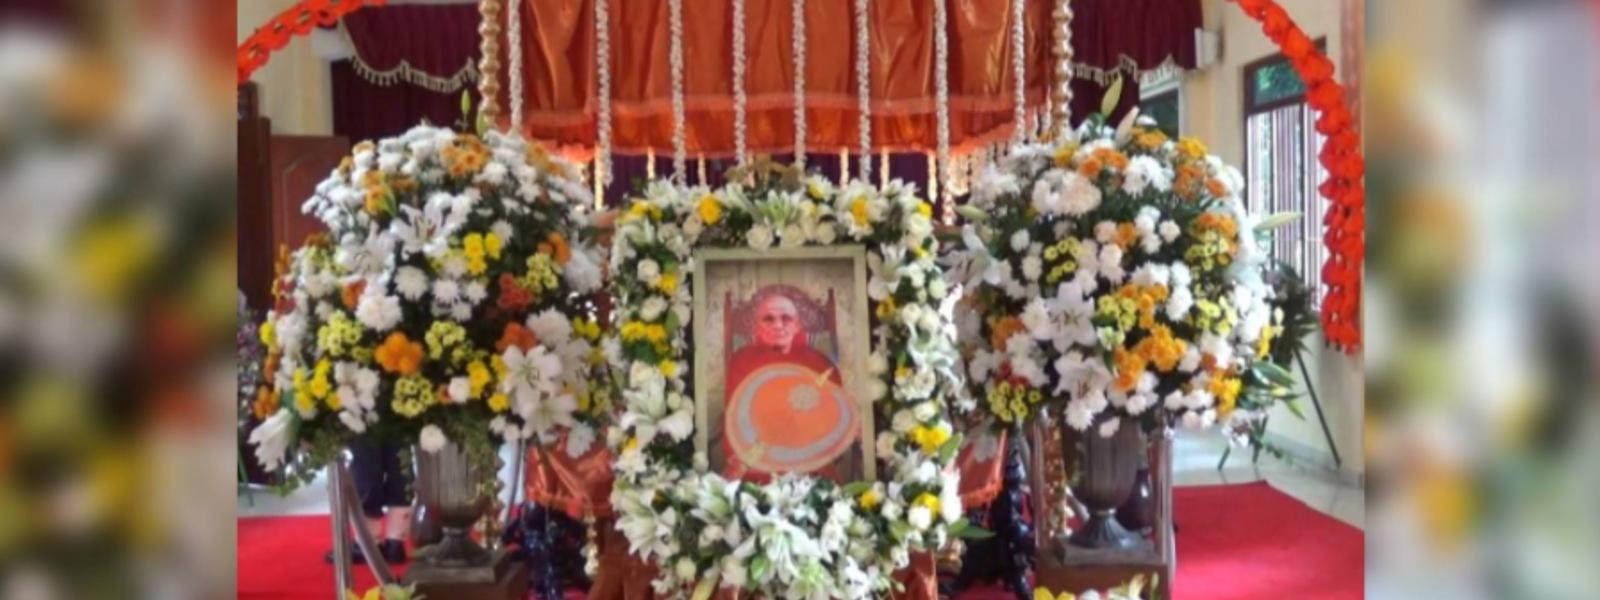 Final rites of Most Ven. Napane Pemasiri Thero today